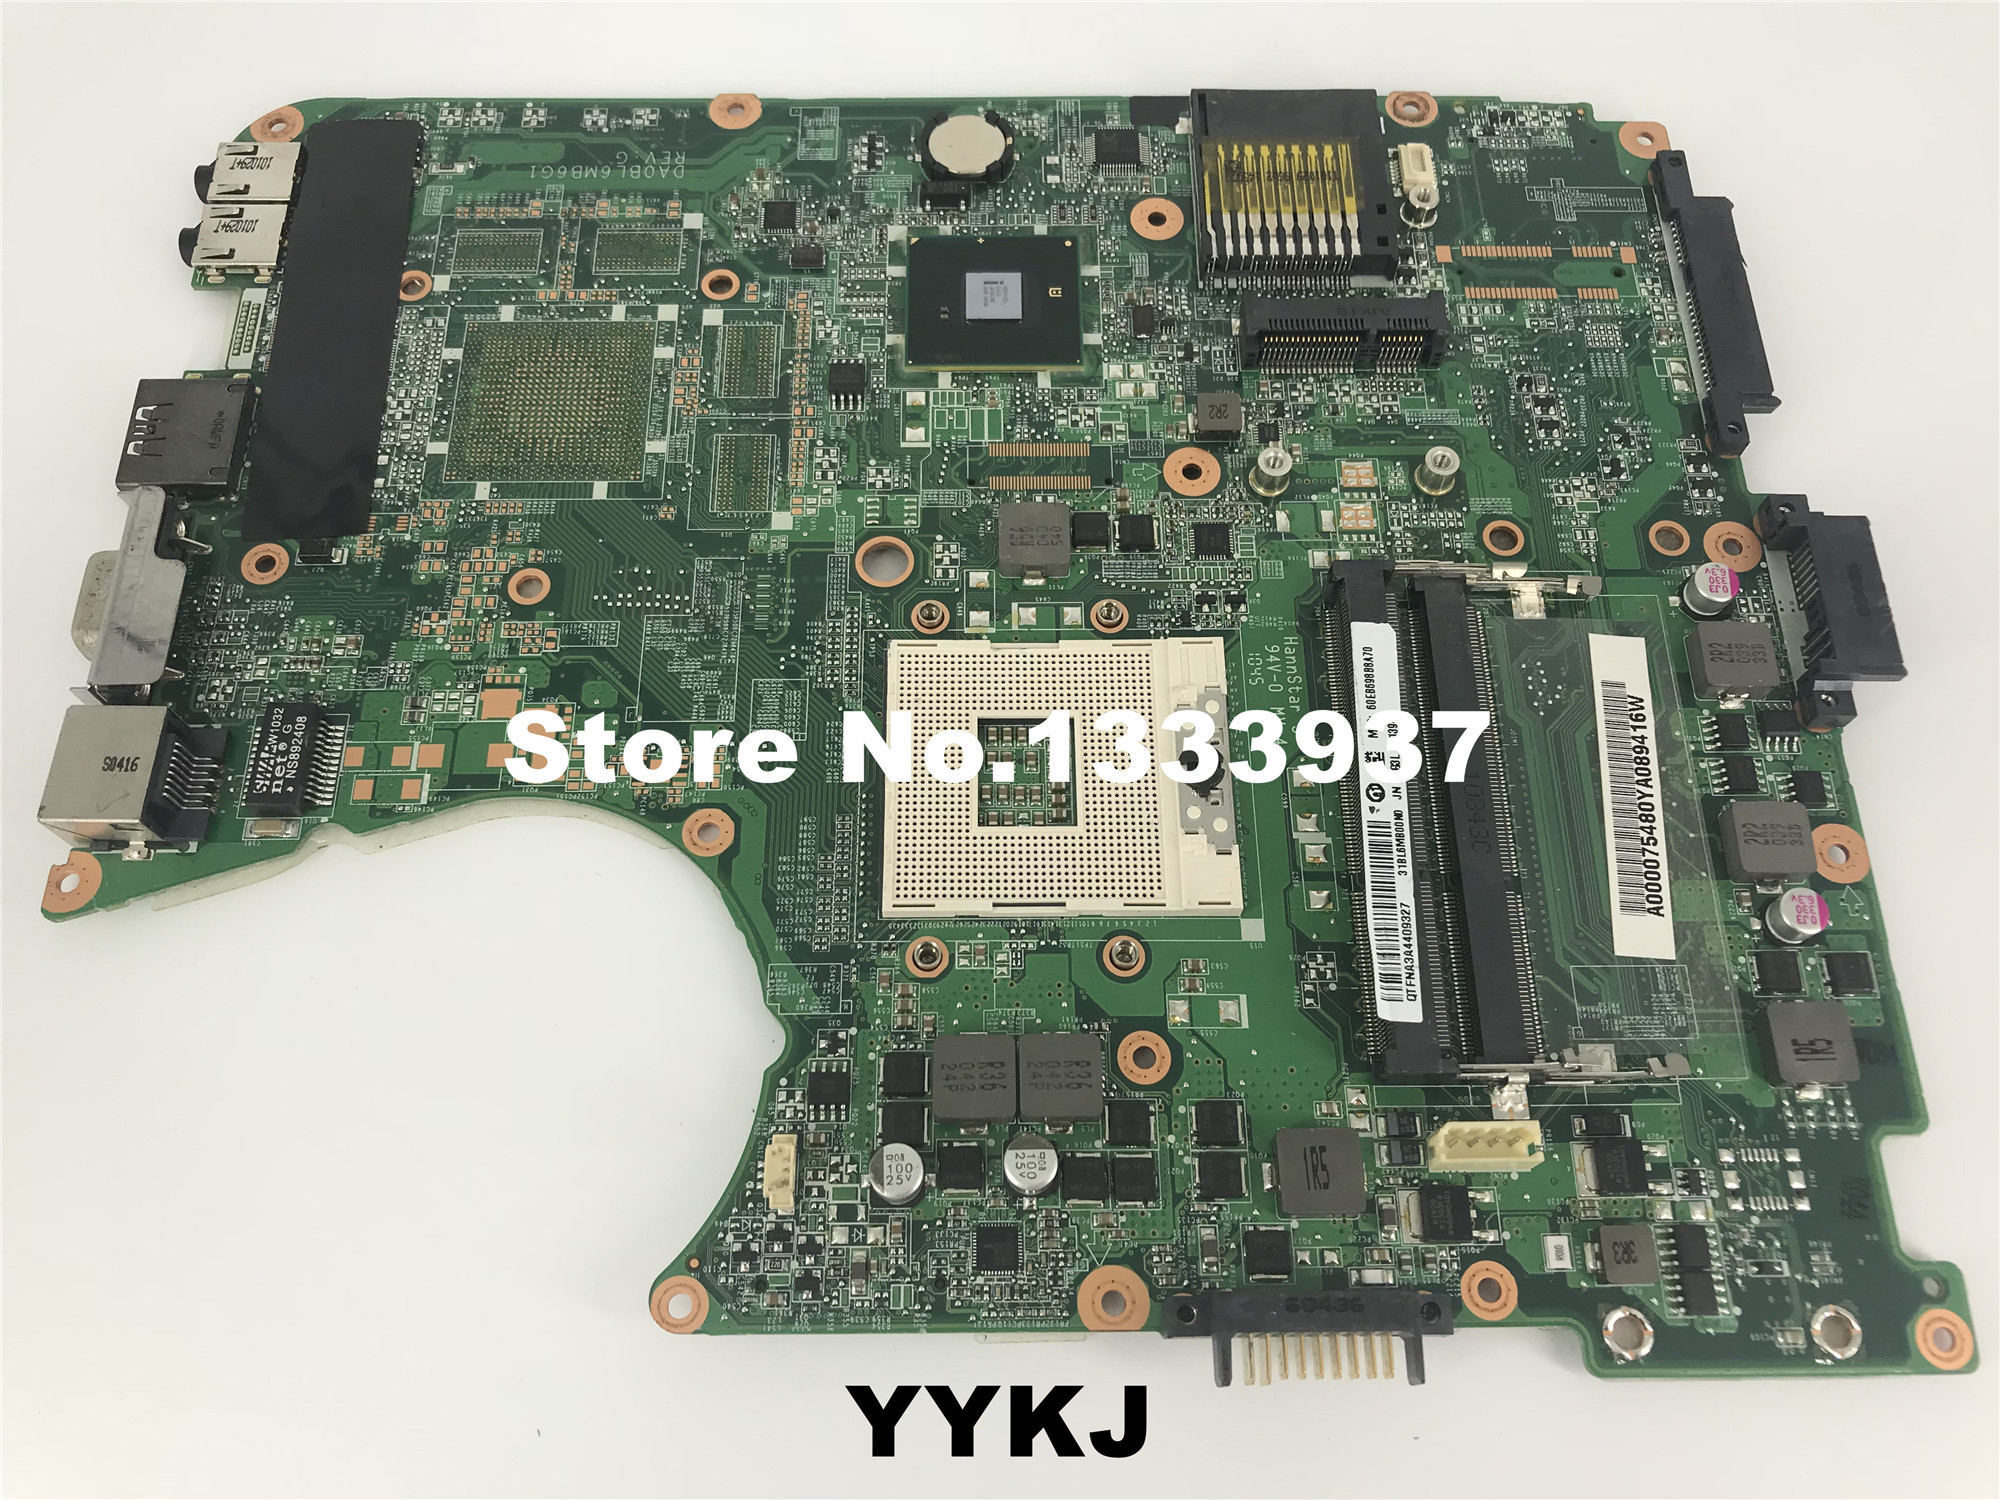 Sunga placa mãe toshiba satélite l655 l650, placa mãe para laptop a000075480 intel hm55 gma hd ddr3 «mainboard